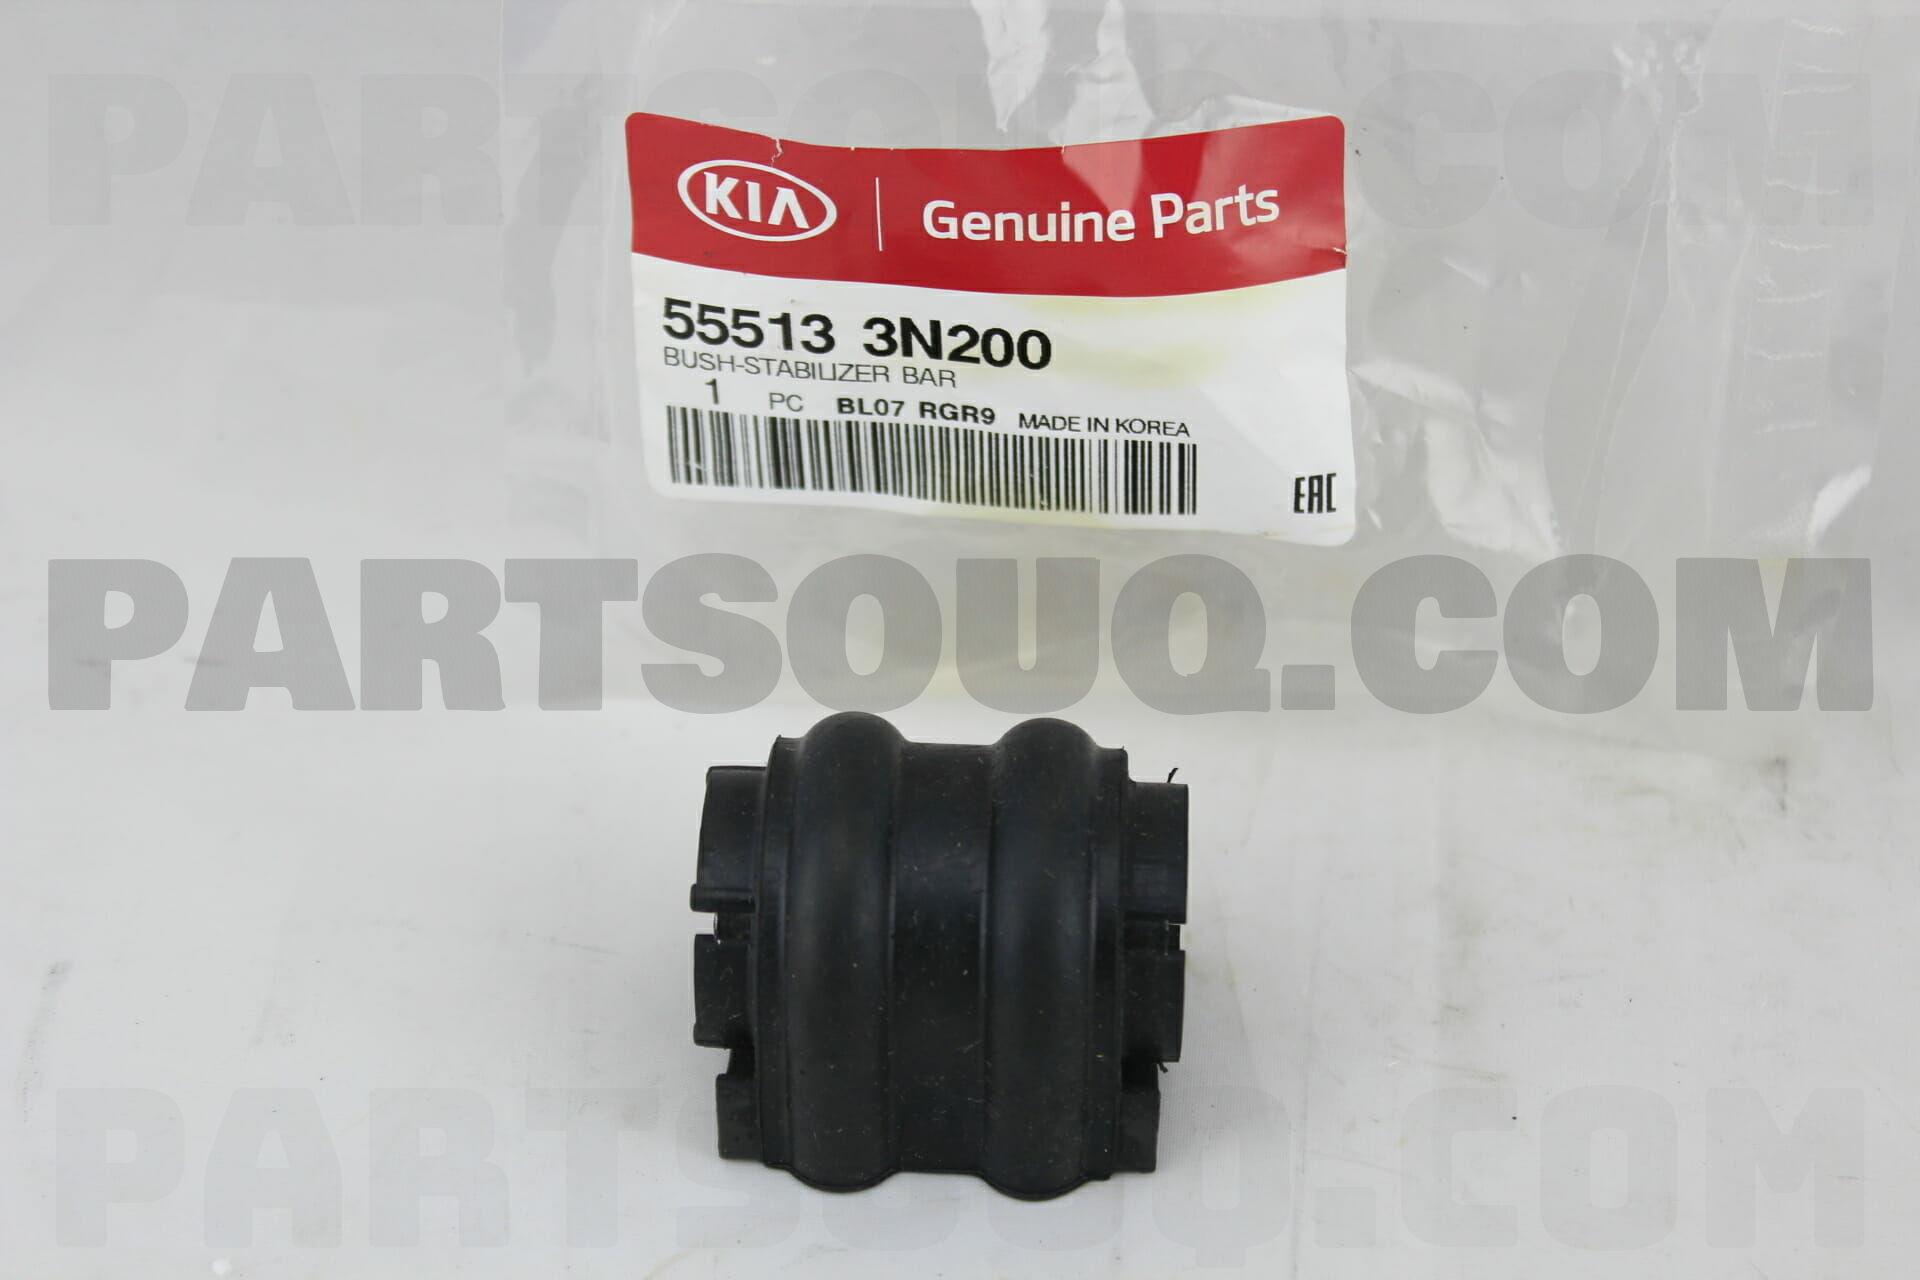 555133N200 Genuine Hyundai KIA BUSH-STABILIZER BAR